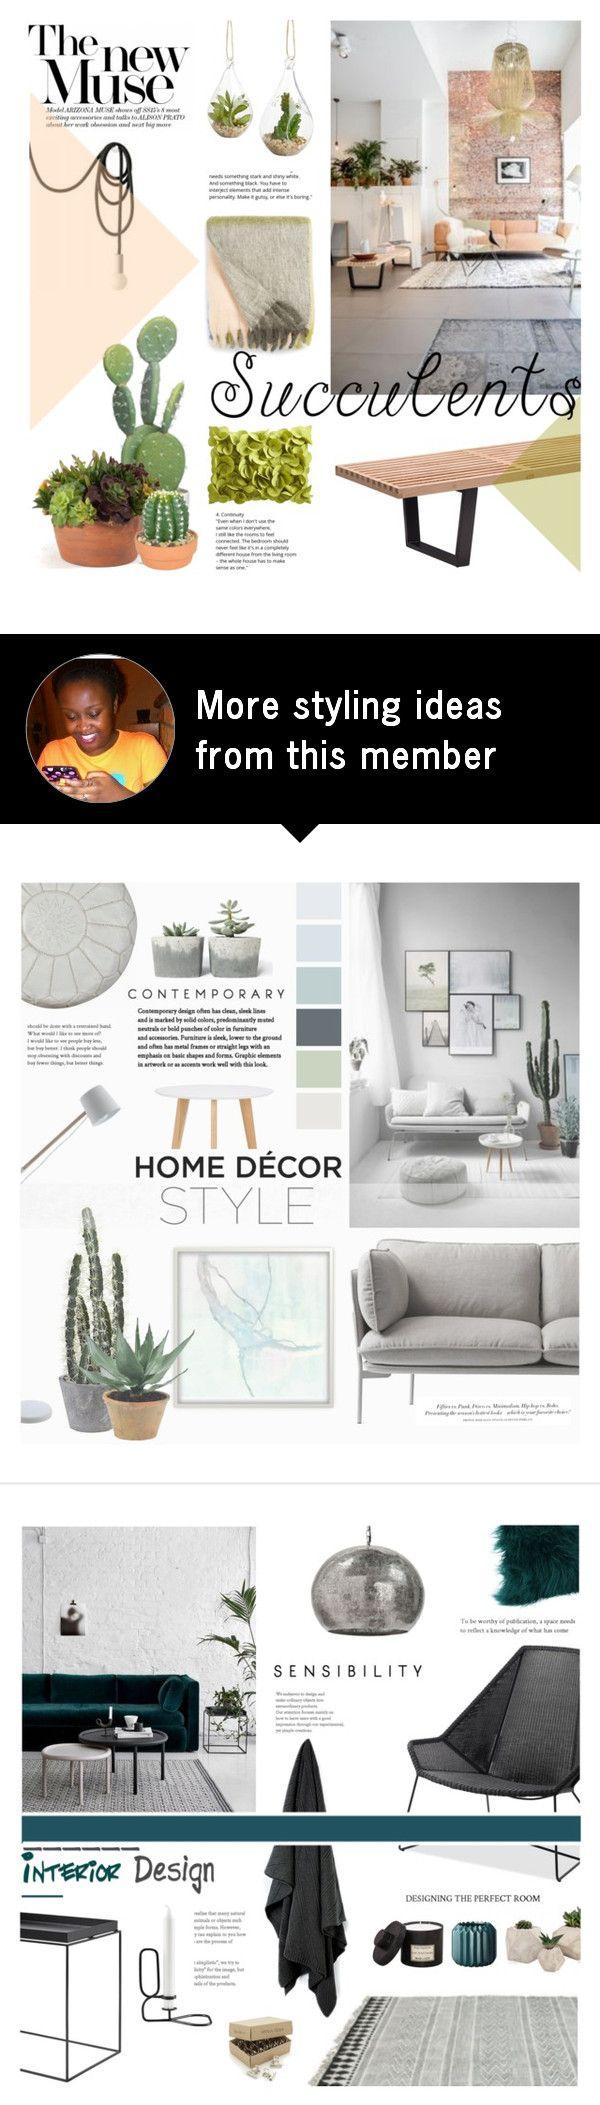 14476 best Top Interior Design Looks images on Pinterest | Home ...